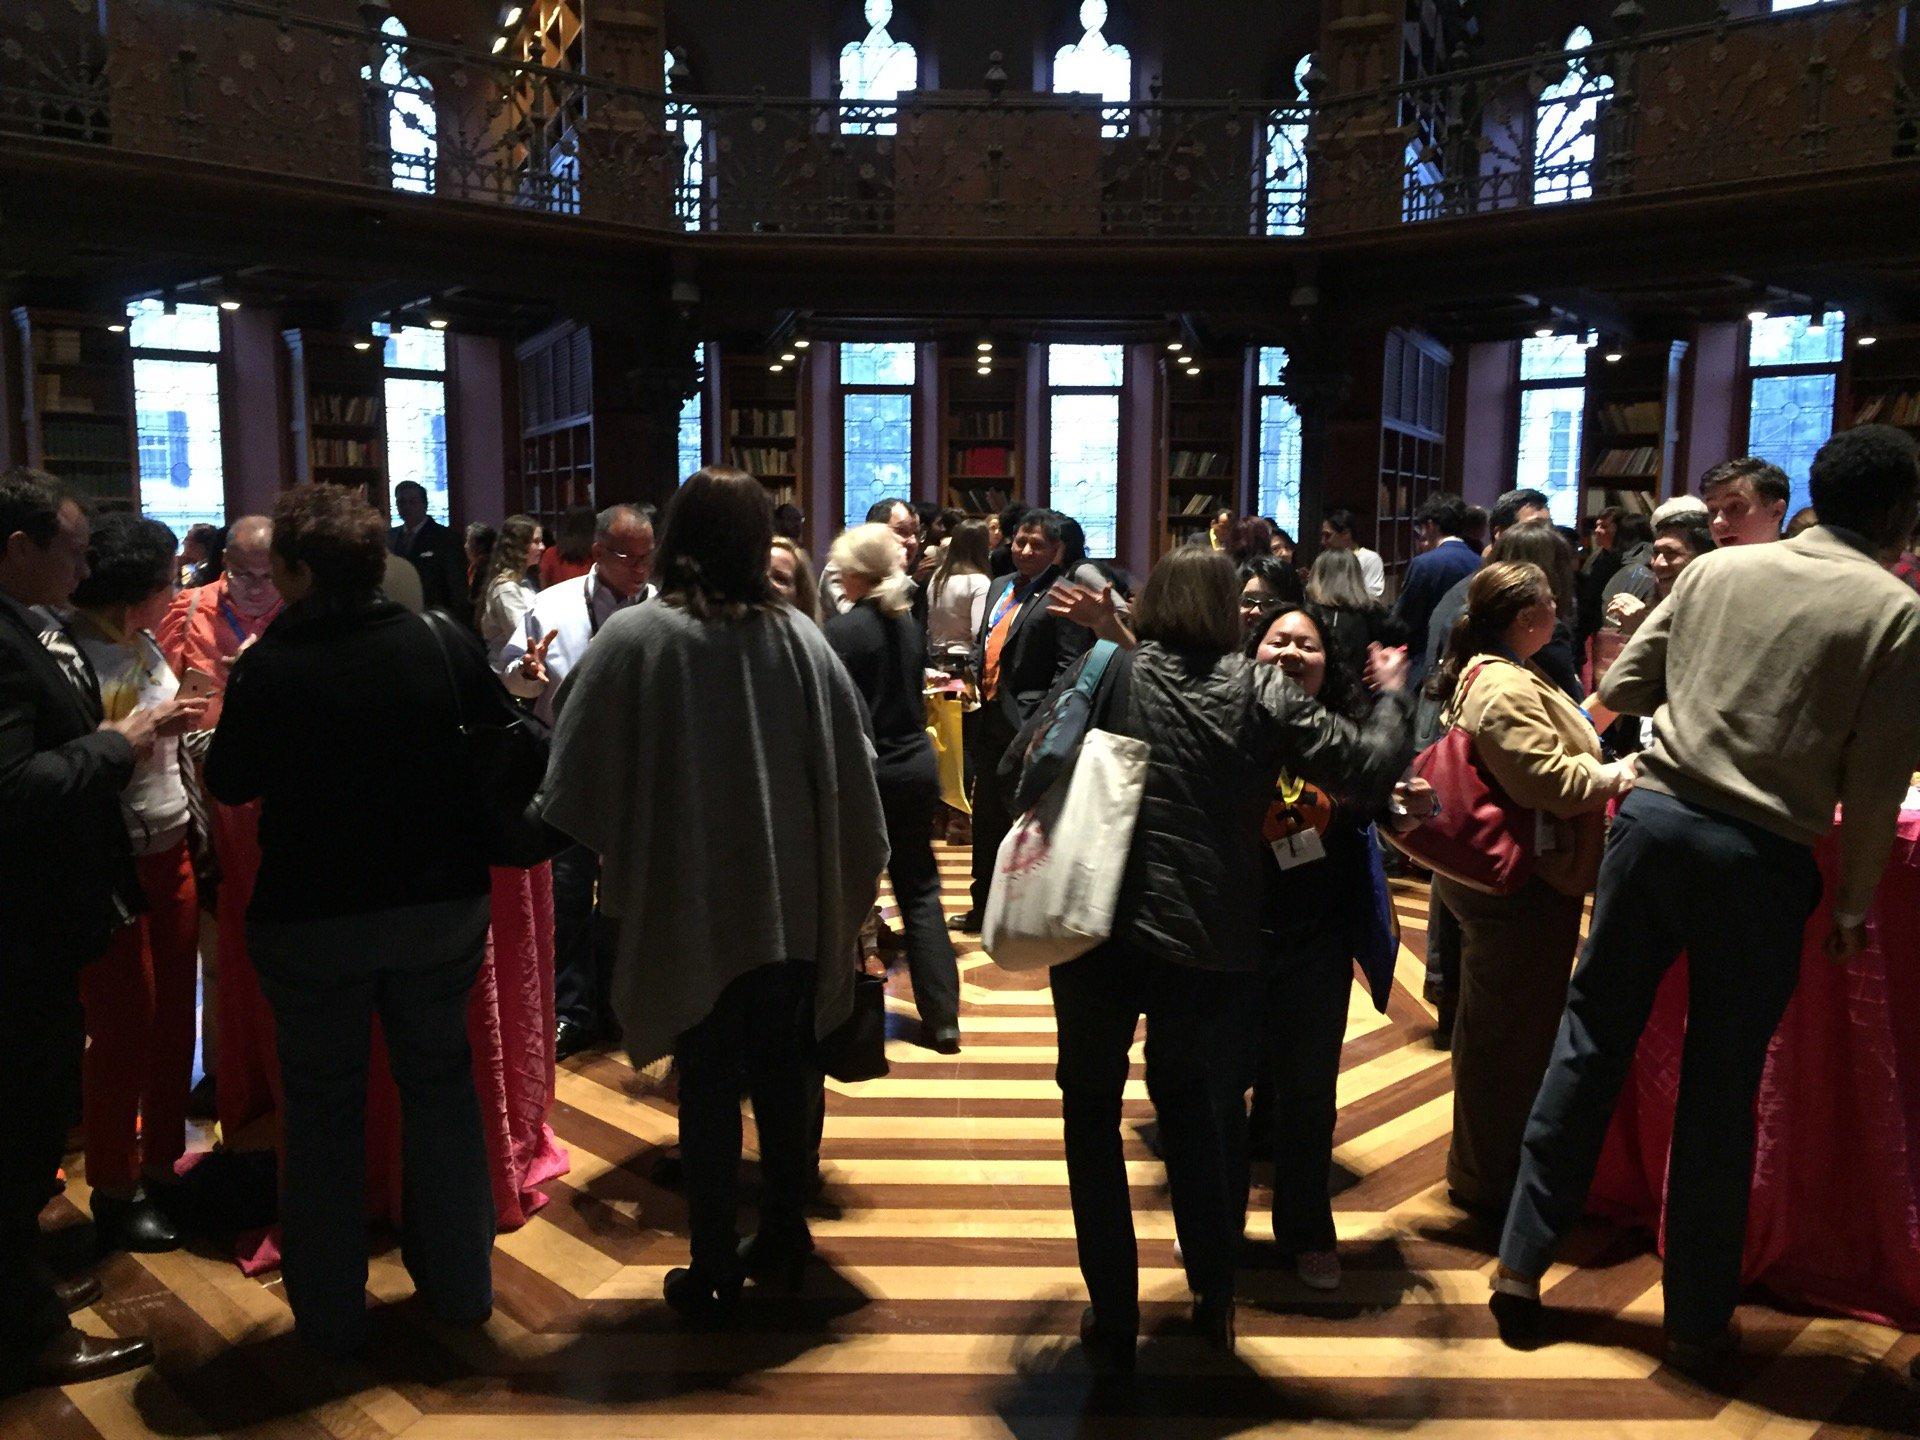 ¡Adelante Tigres! Reception! #AdelantePrinceton (@ Chancellor Green Hall in Princeton, NJ) https://t.co/9m6rjxUfKG https://t.co/ojxXCiMkfe